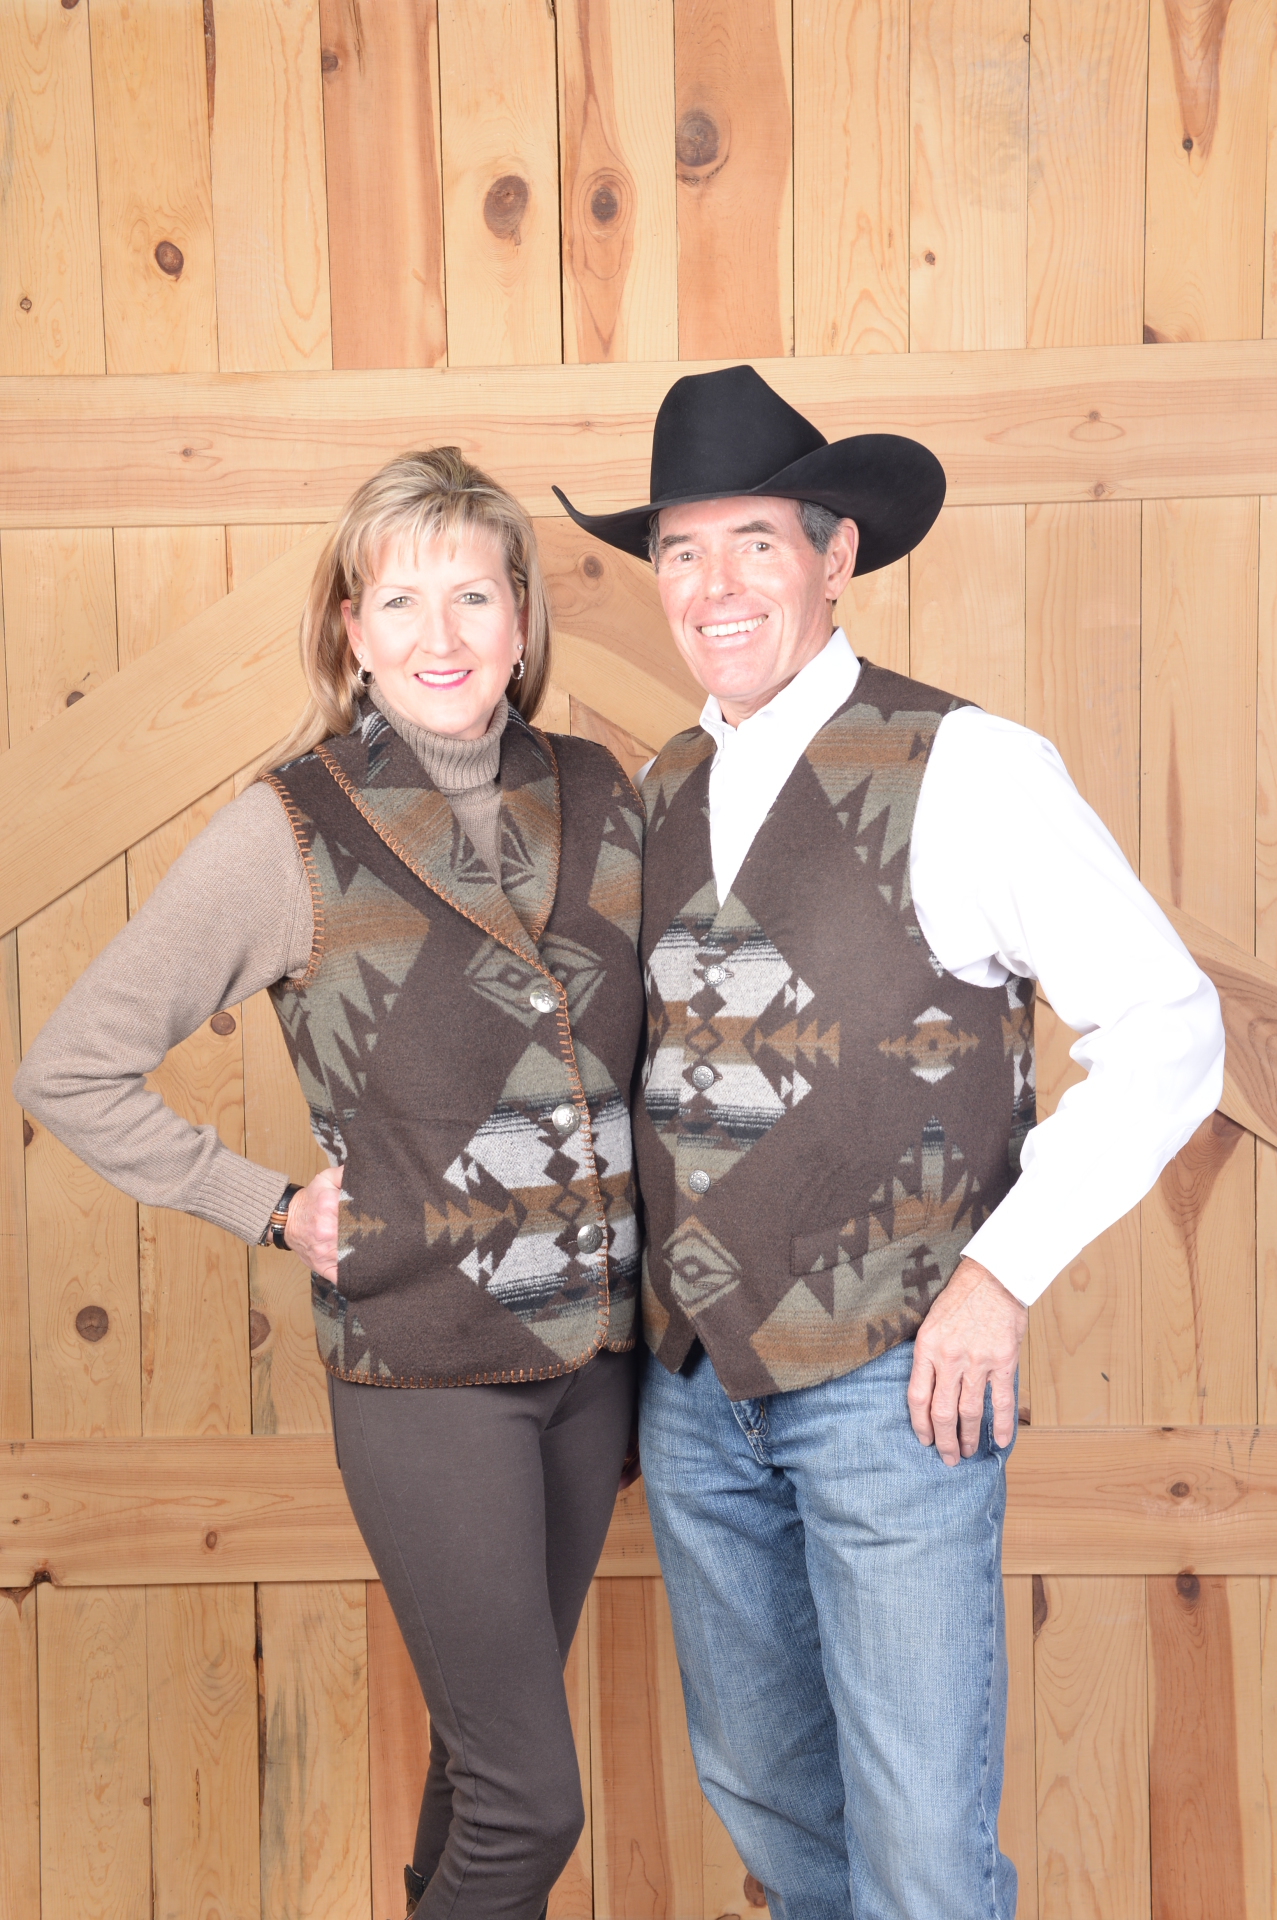 KEMOSABE  VESTS - #130 Ladies' vest S - 2X - $99.95 - Men's S-XL -- $169.95 - 2X - 3X & Talls are $179.95